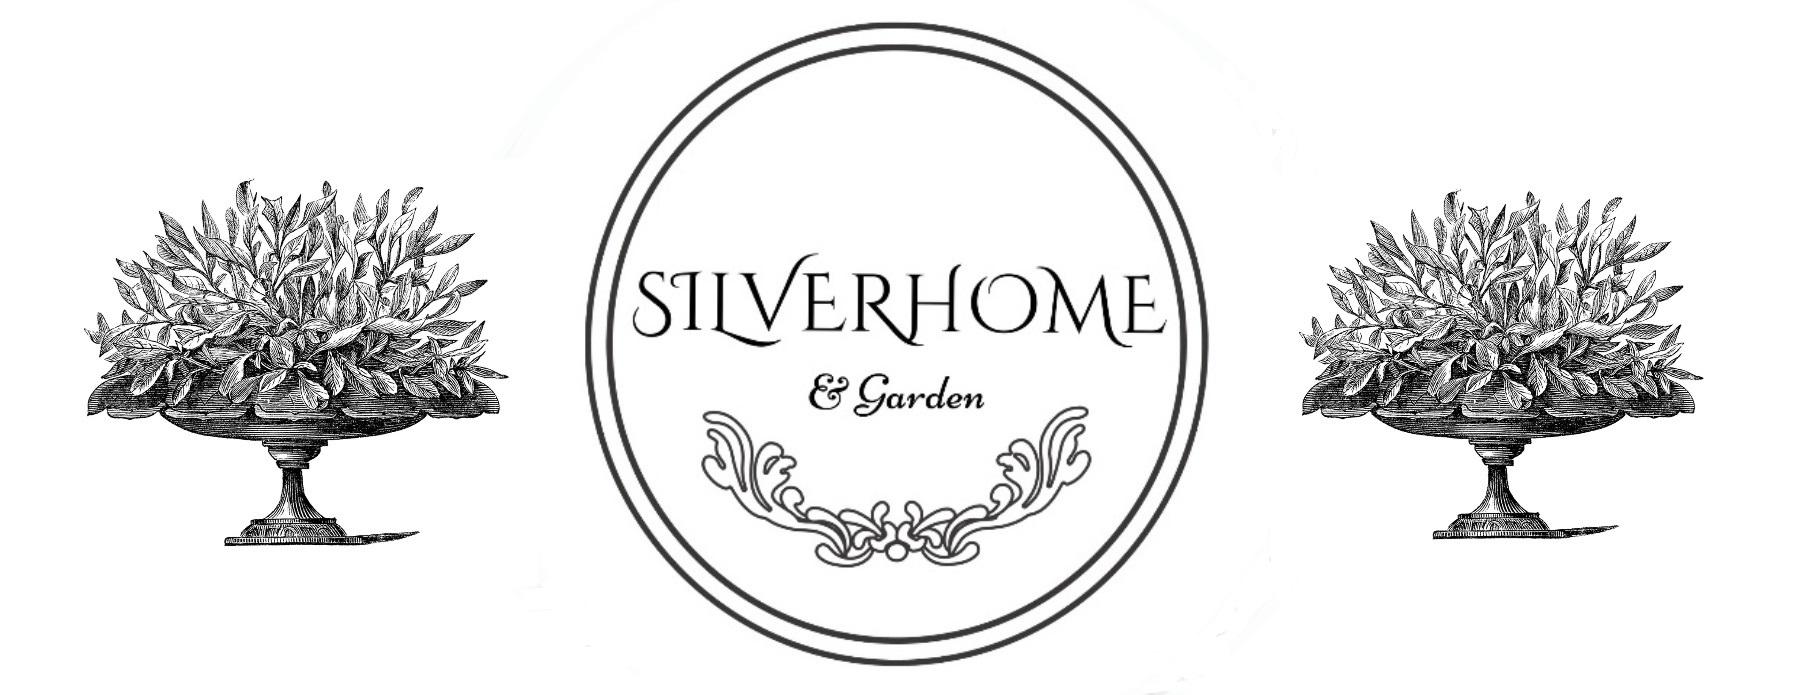 Silverhome